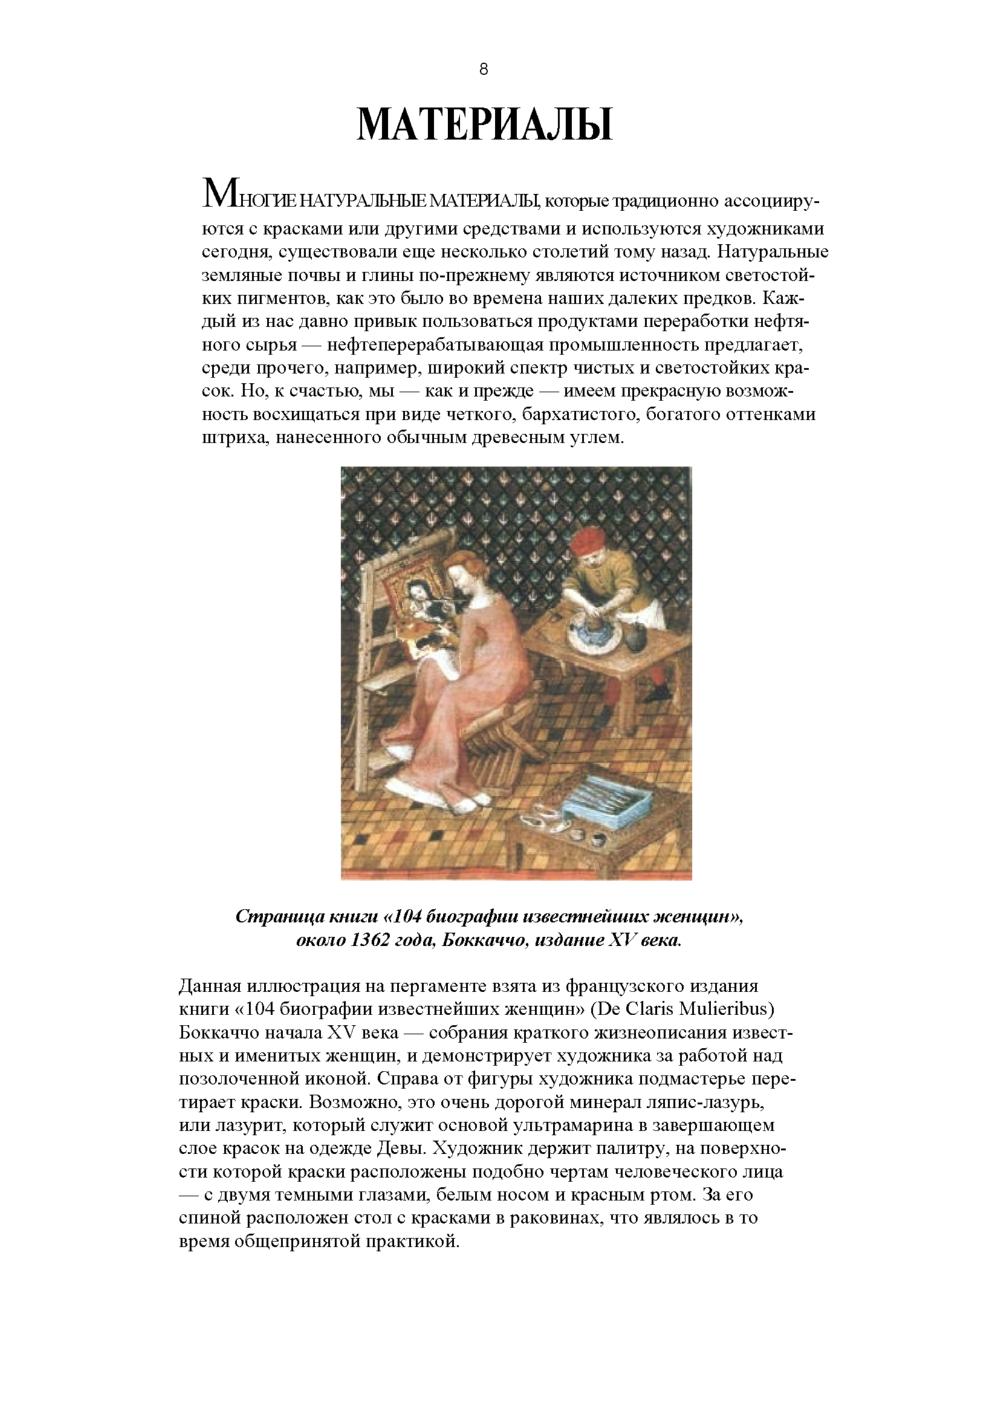 http://i6.imageban.ru/out/2013/12/12/04c5cc9fe64ef081181c9c8d96a2b3e1.jpg